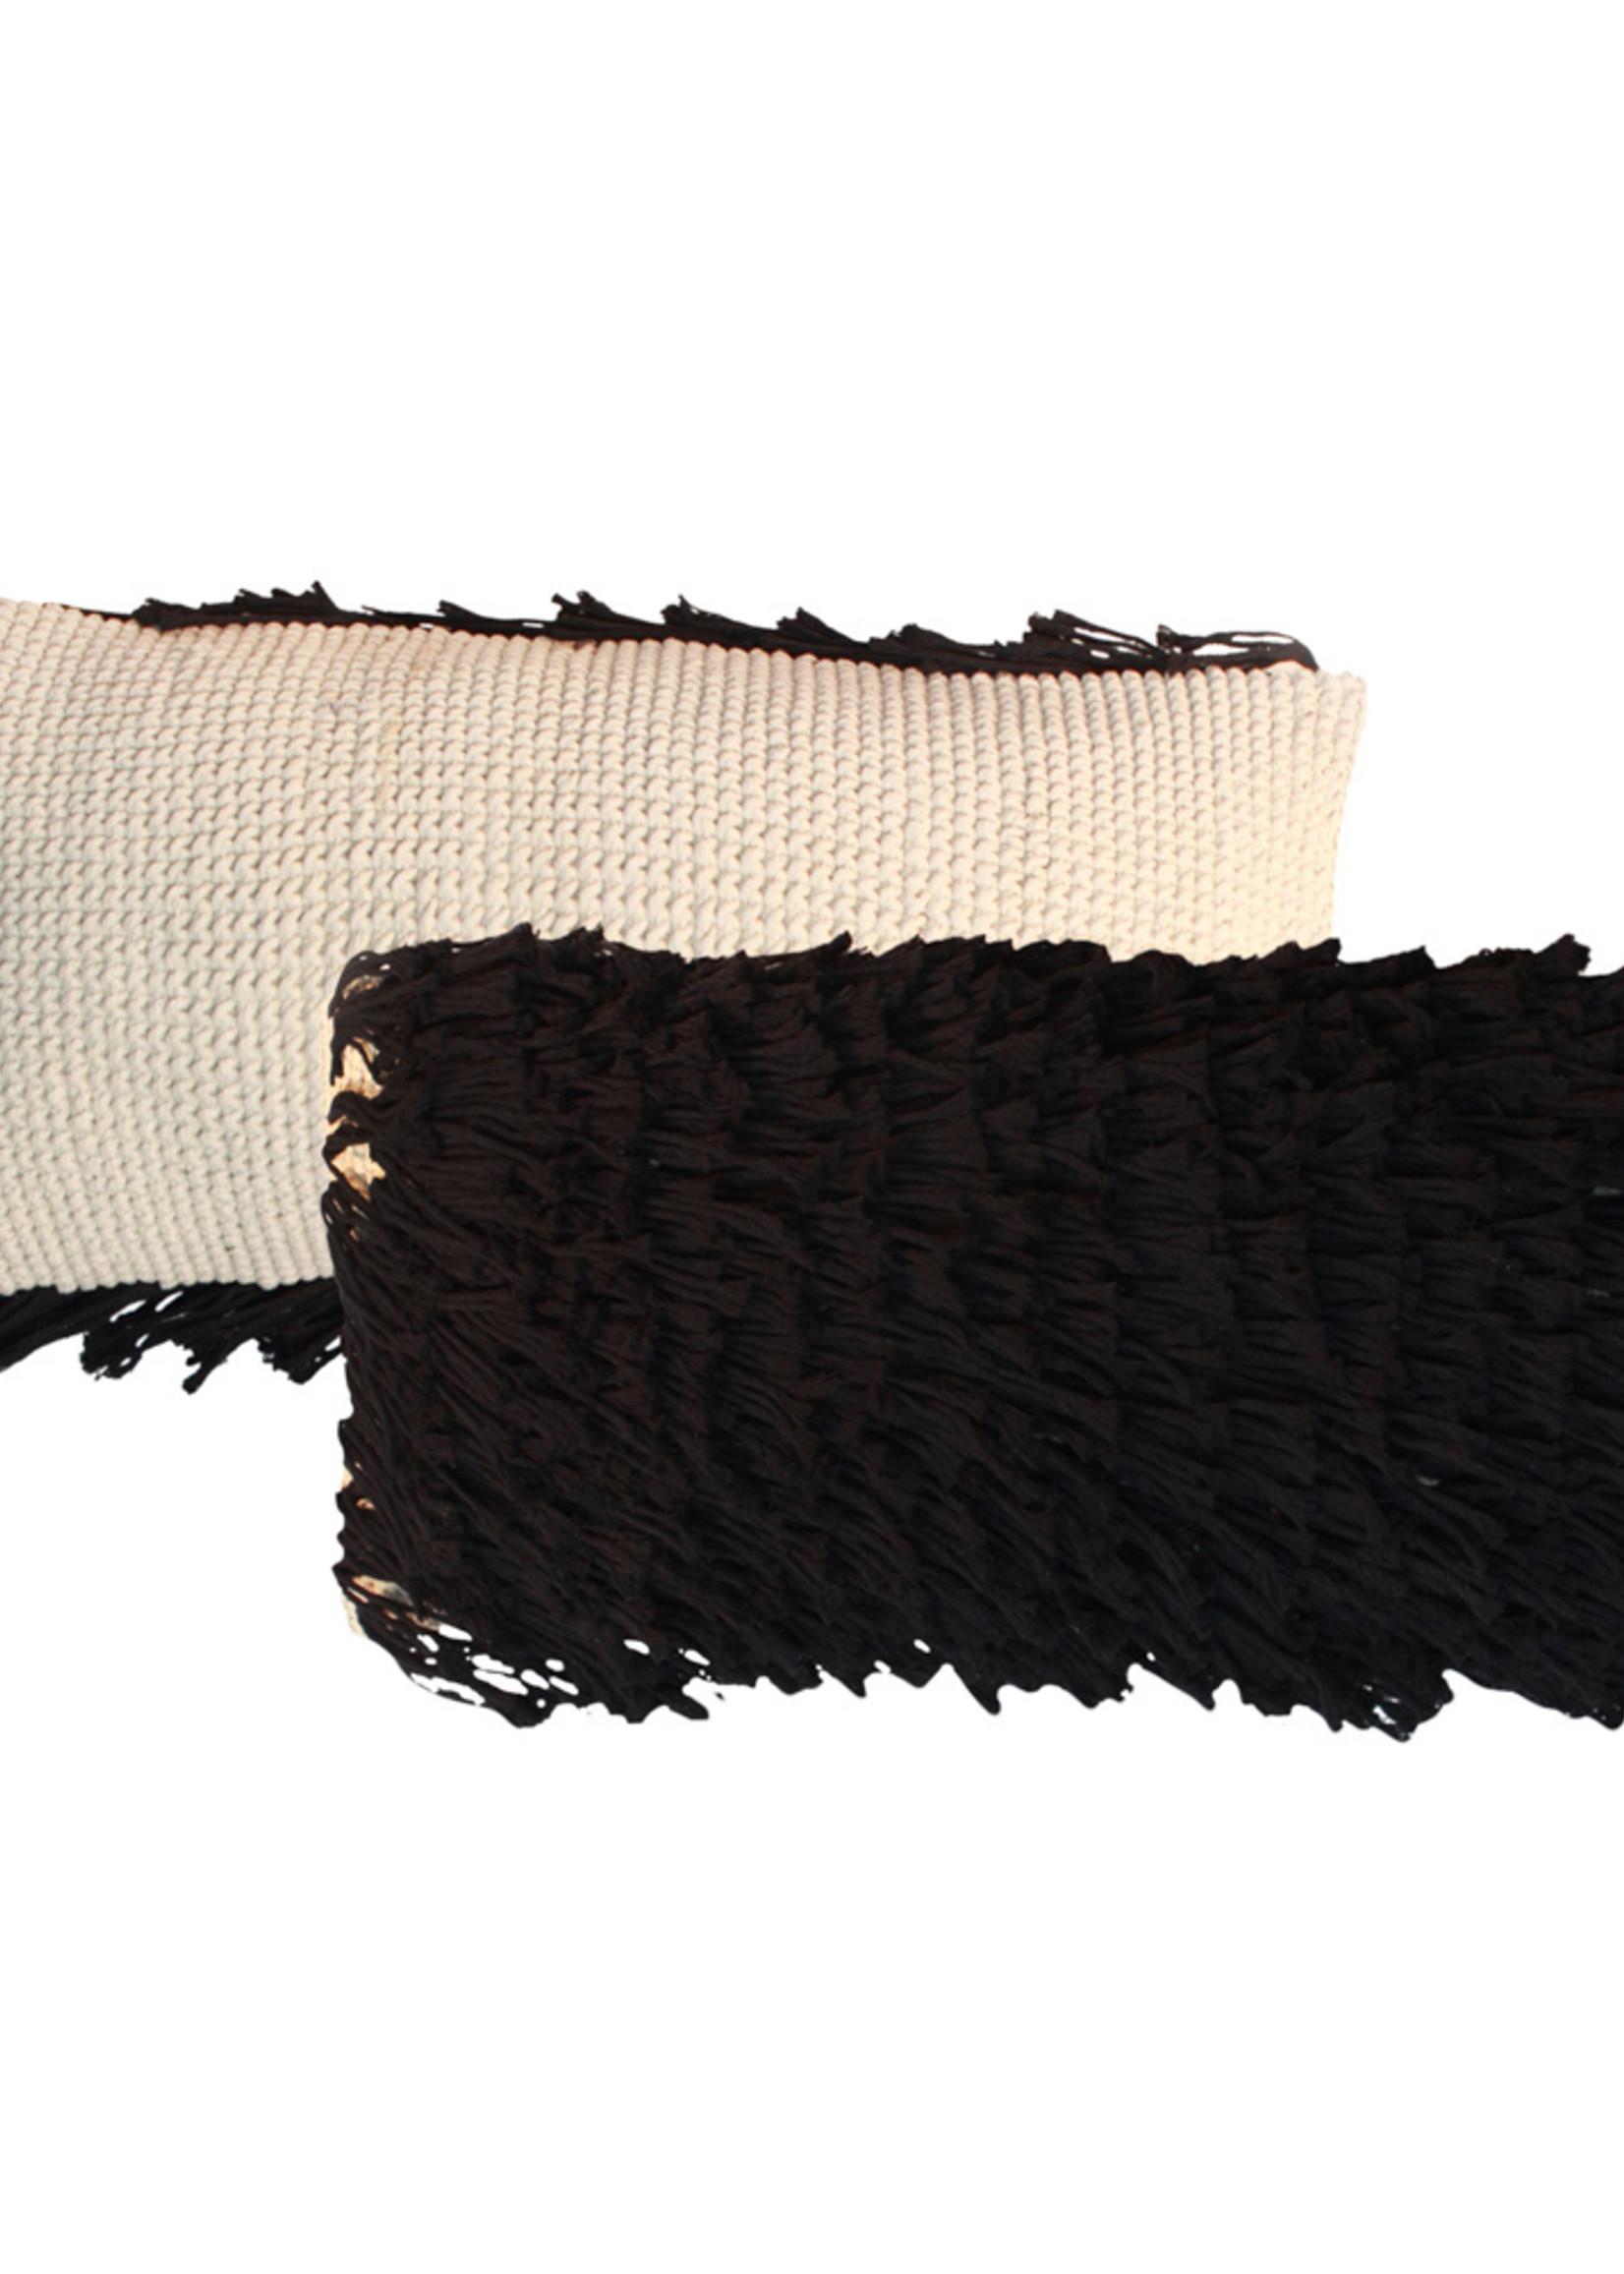 The Macrame Fringed Cushion - Natural Black